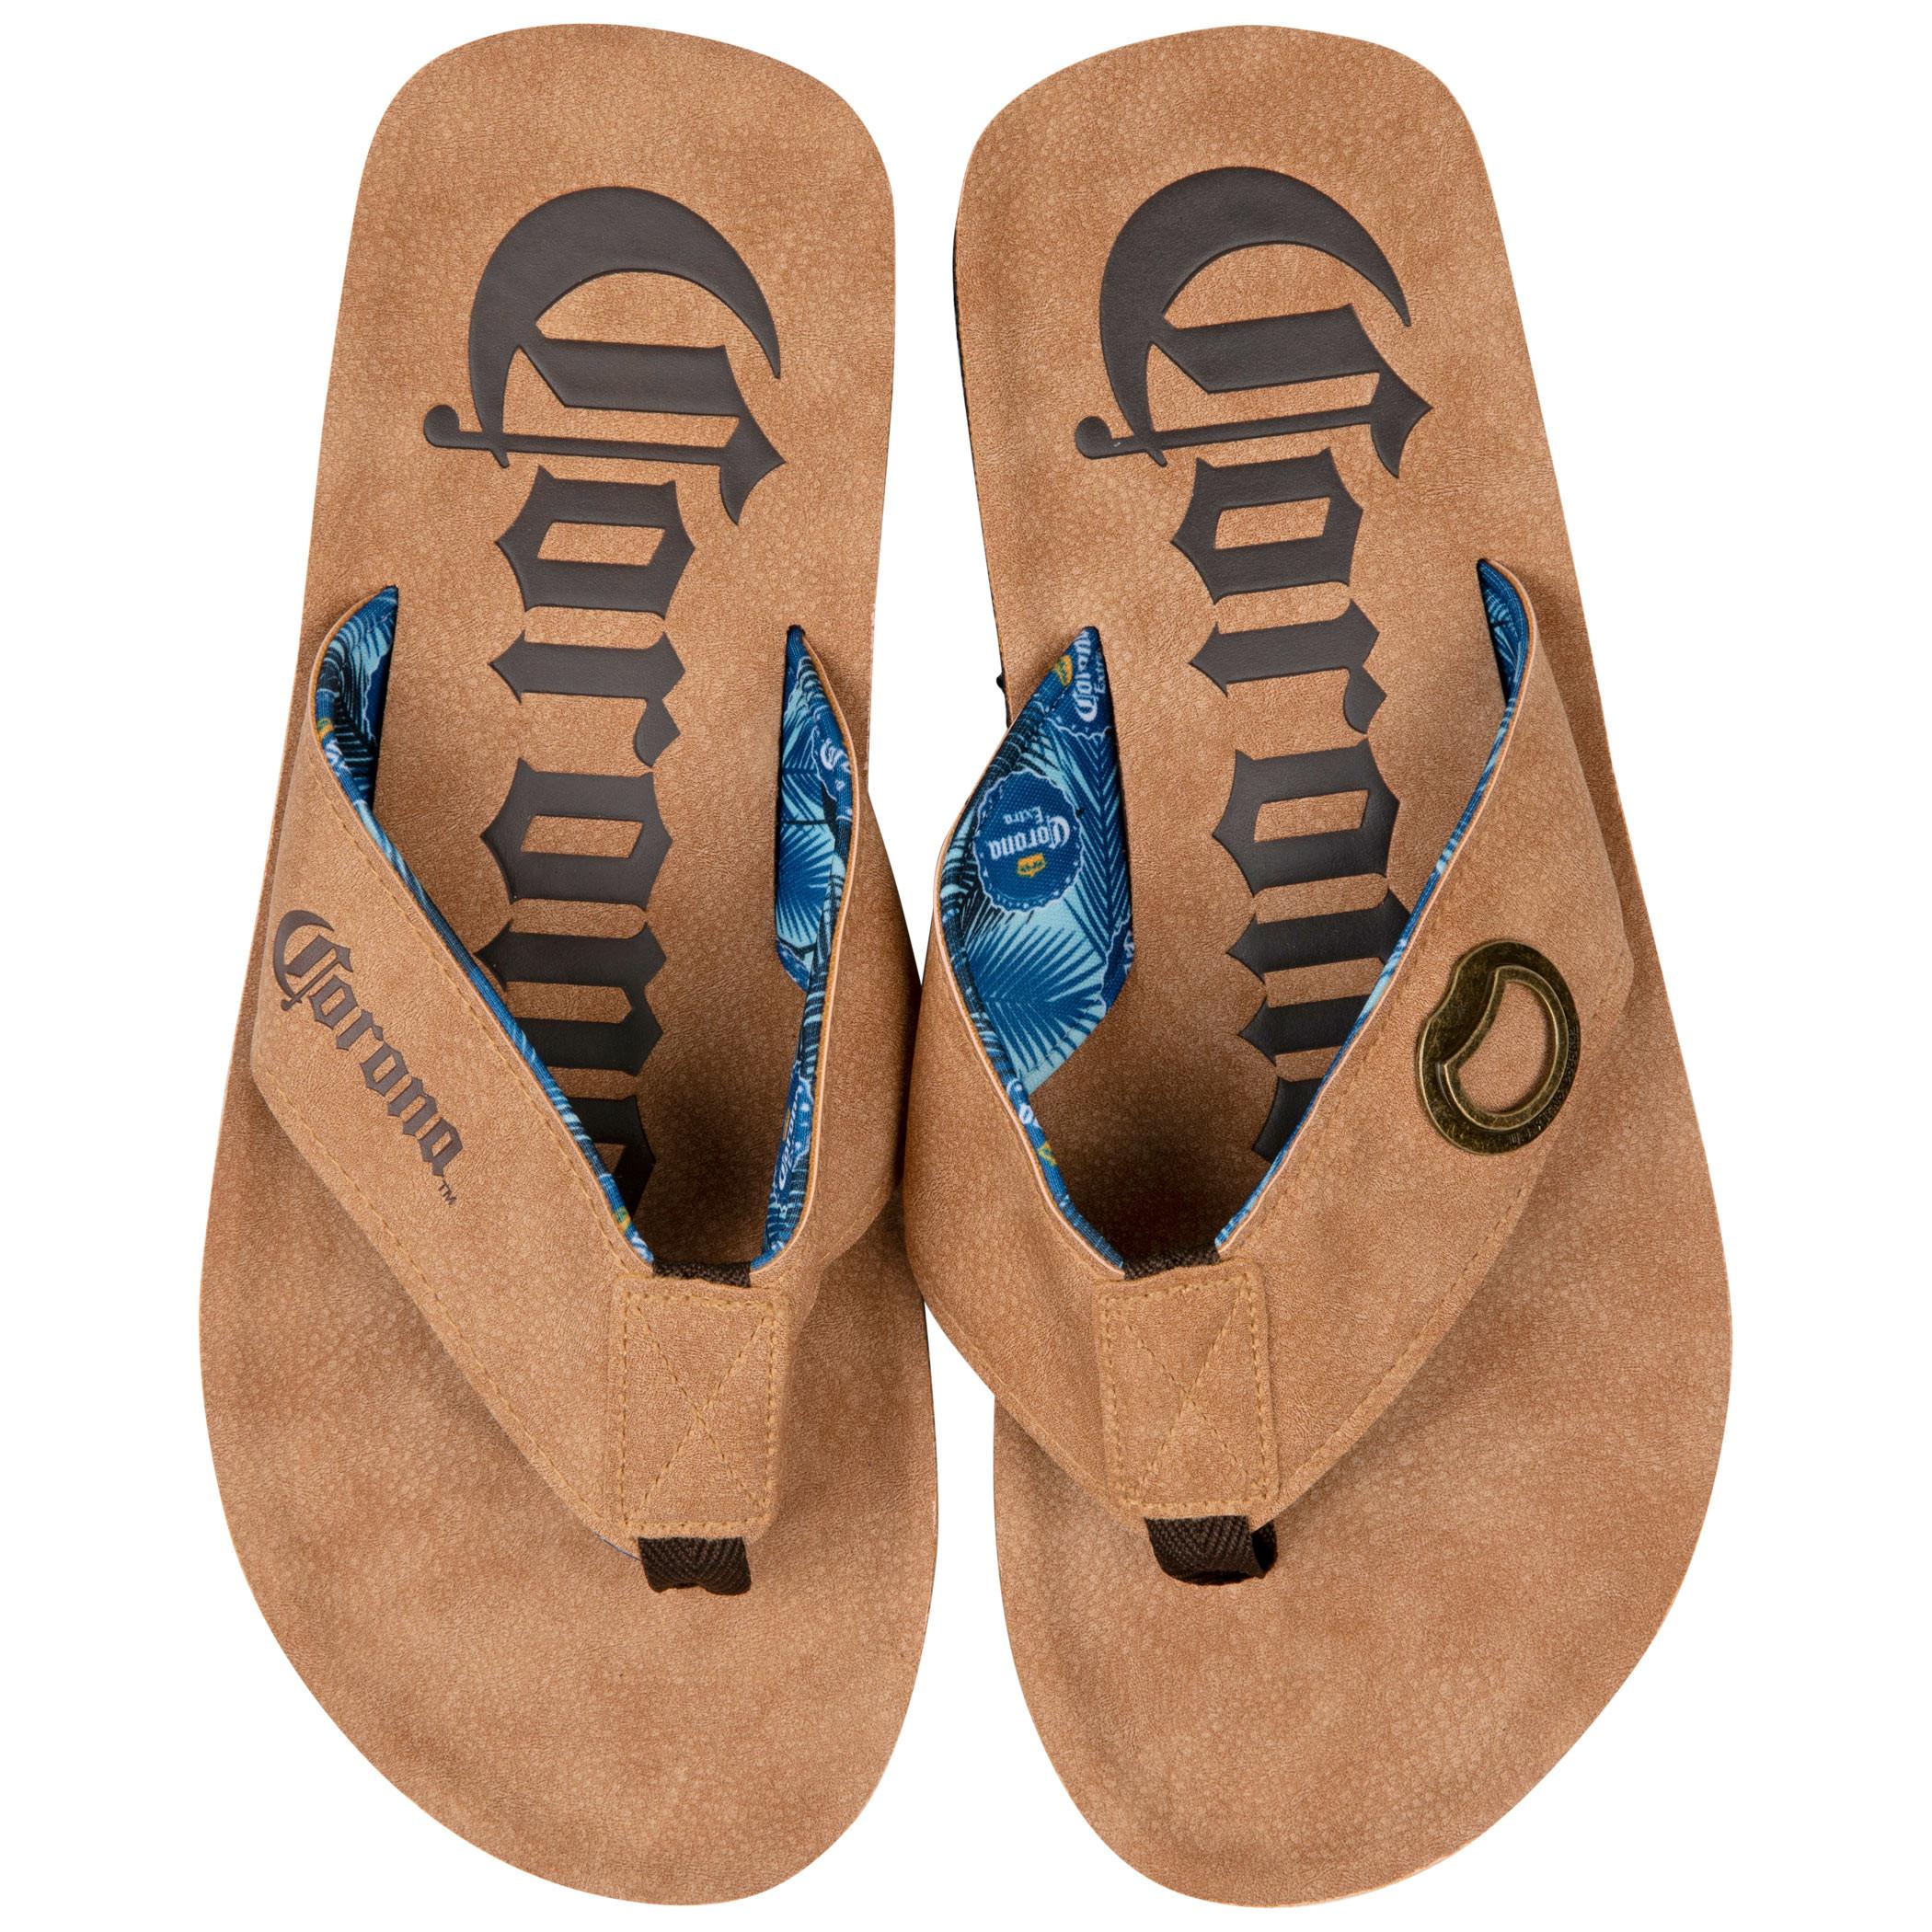 Corona Extra Bottle Opener Flip Flop Sandal